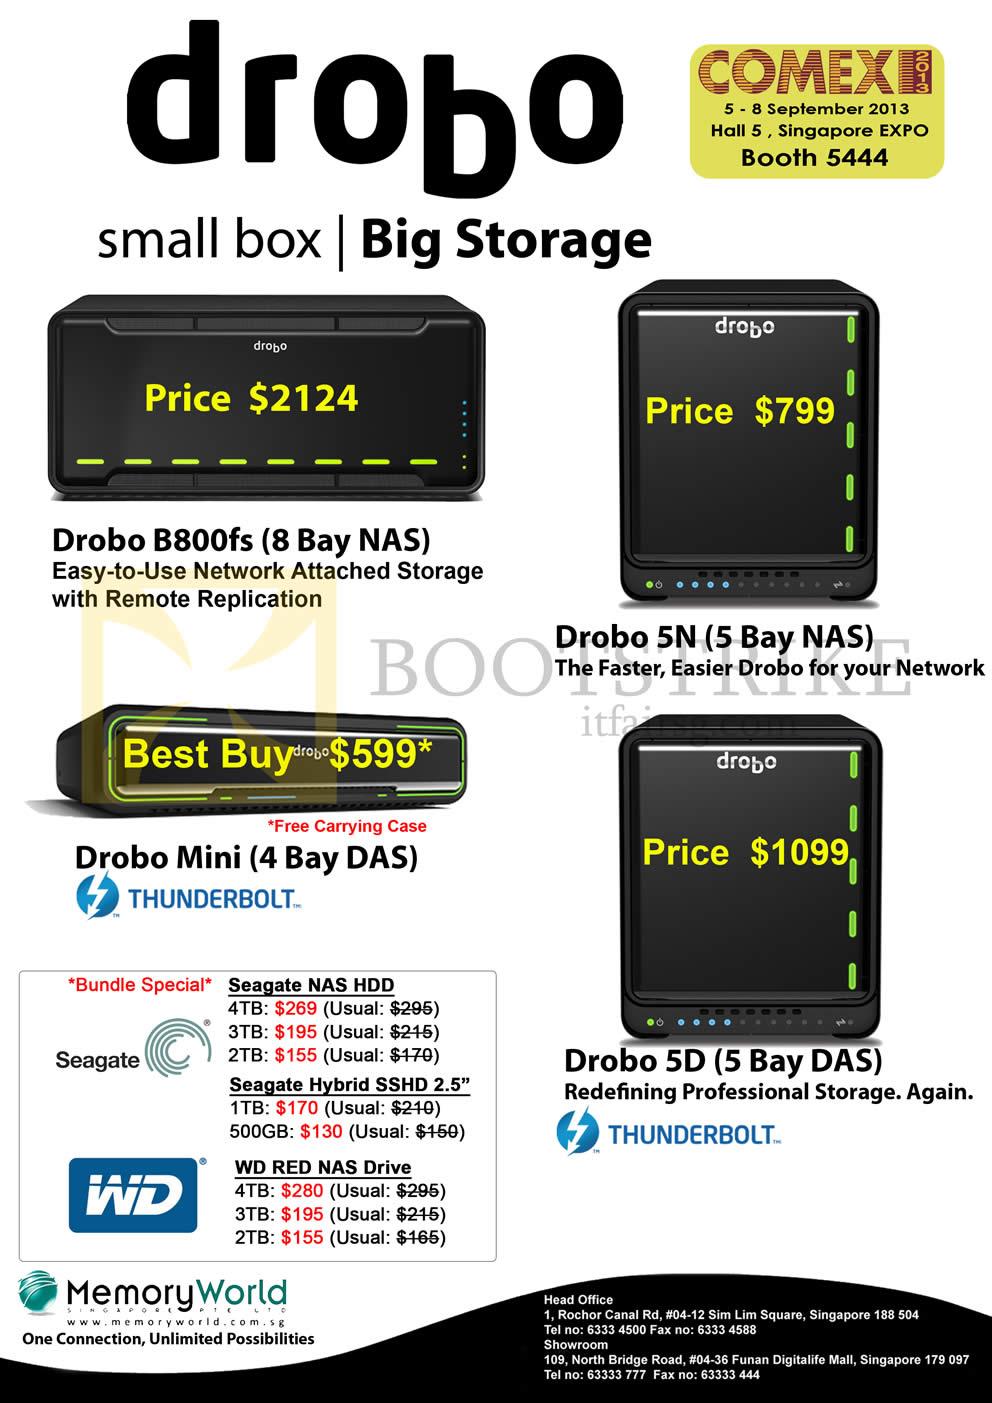 COMEX 2013 price list image brochure of Memory World Drobo NAS B800fs, 5N, Mini, 5D